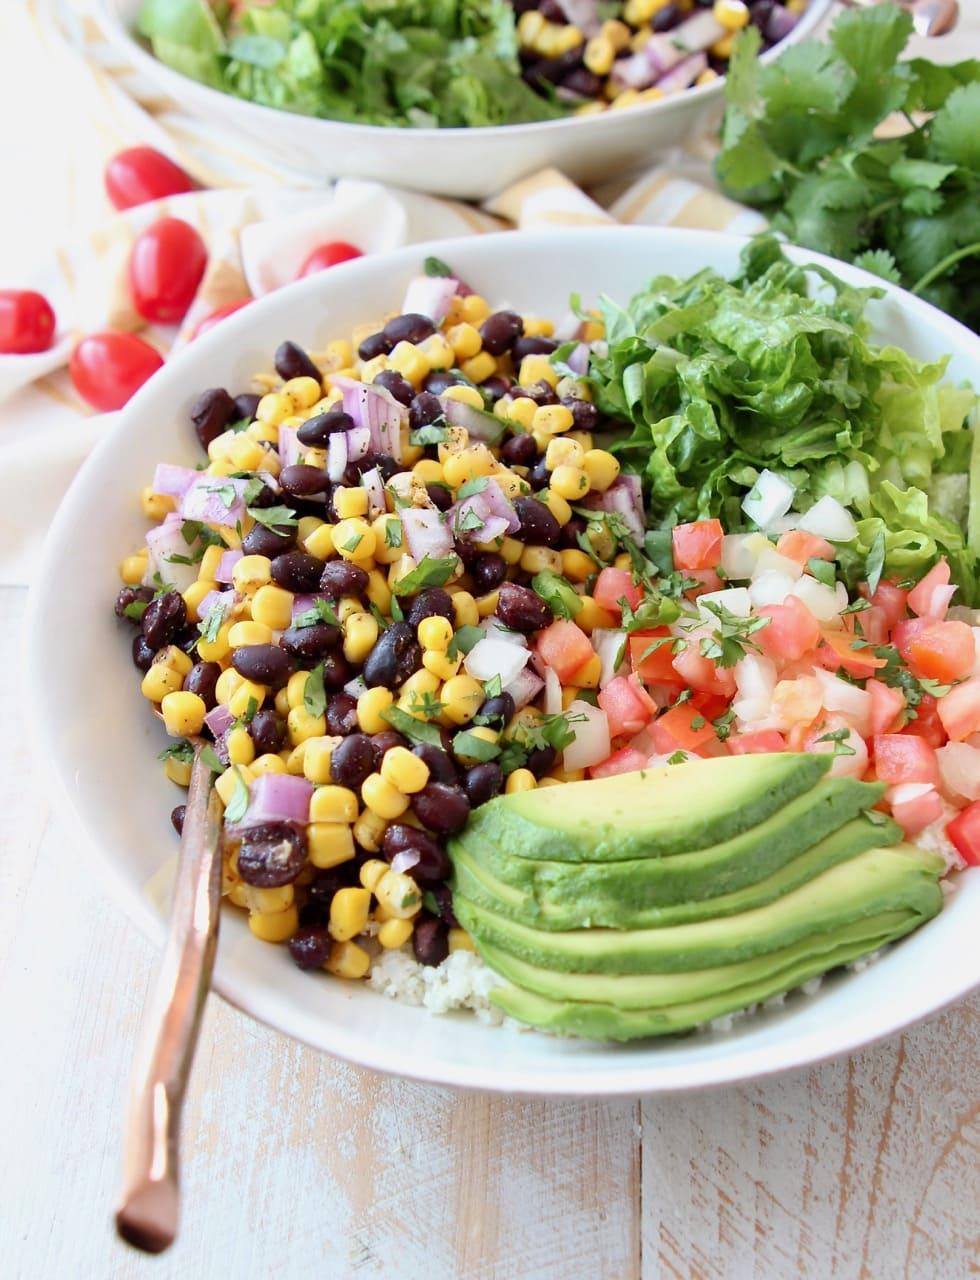 Vegan burrito bowl topped with avocado, black beans, corn, tomatoes and romaine lettuce